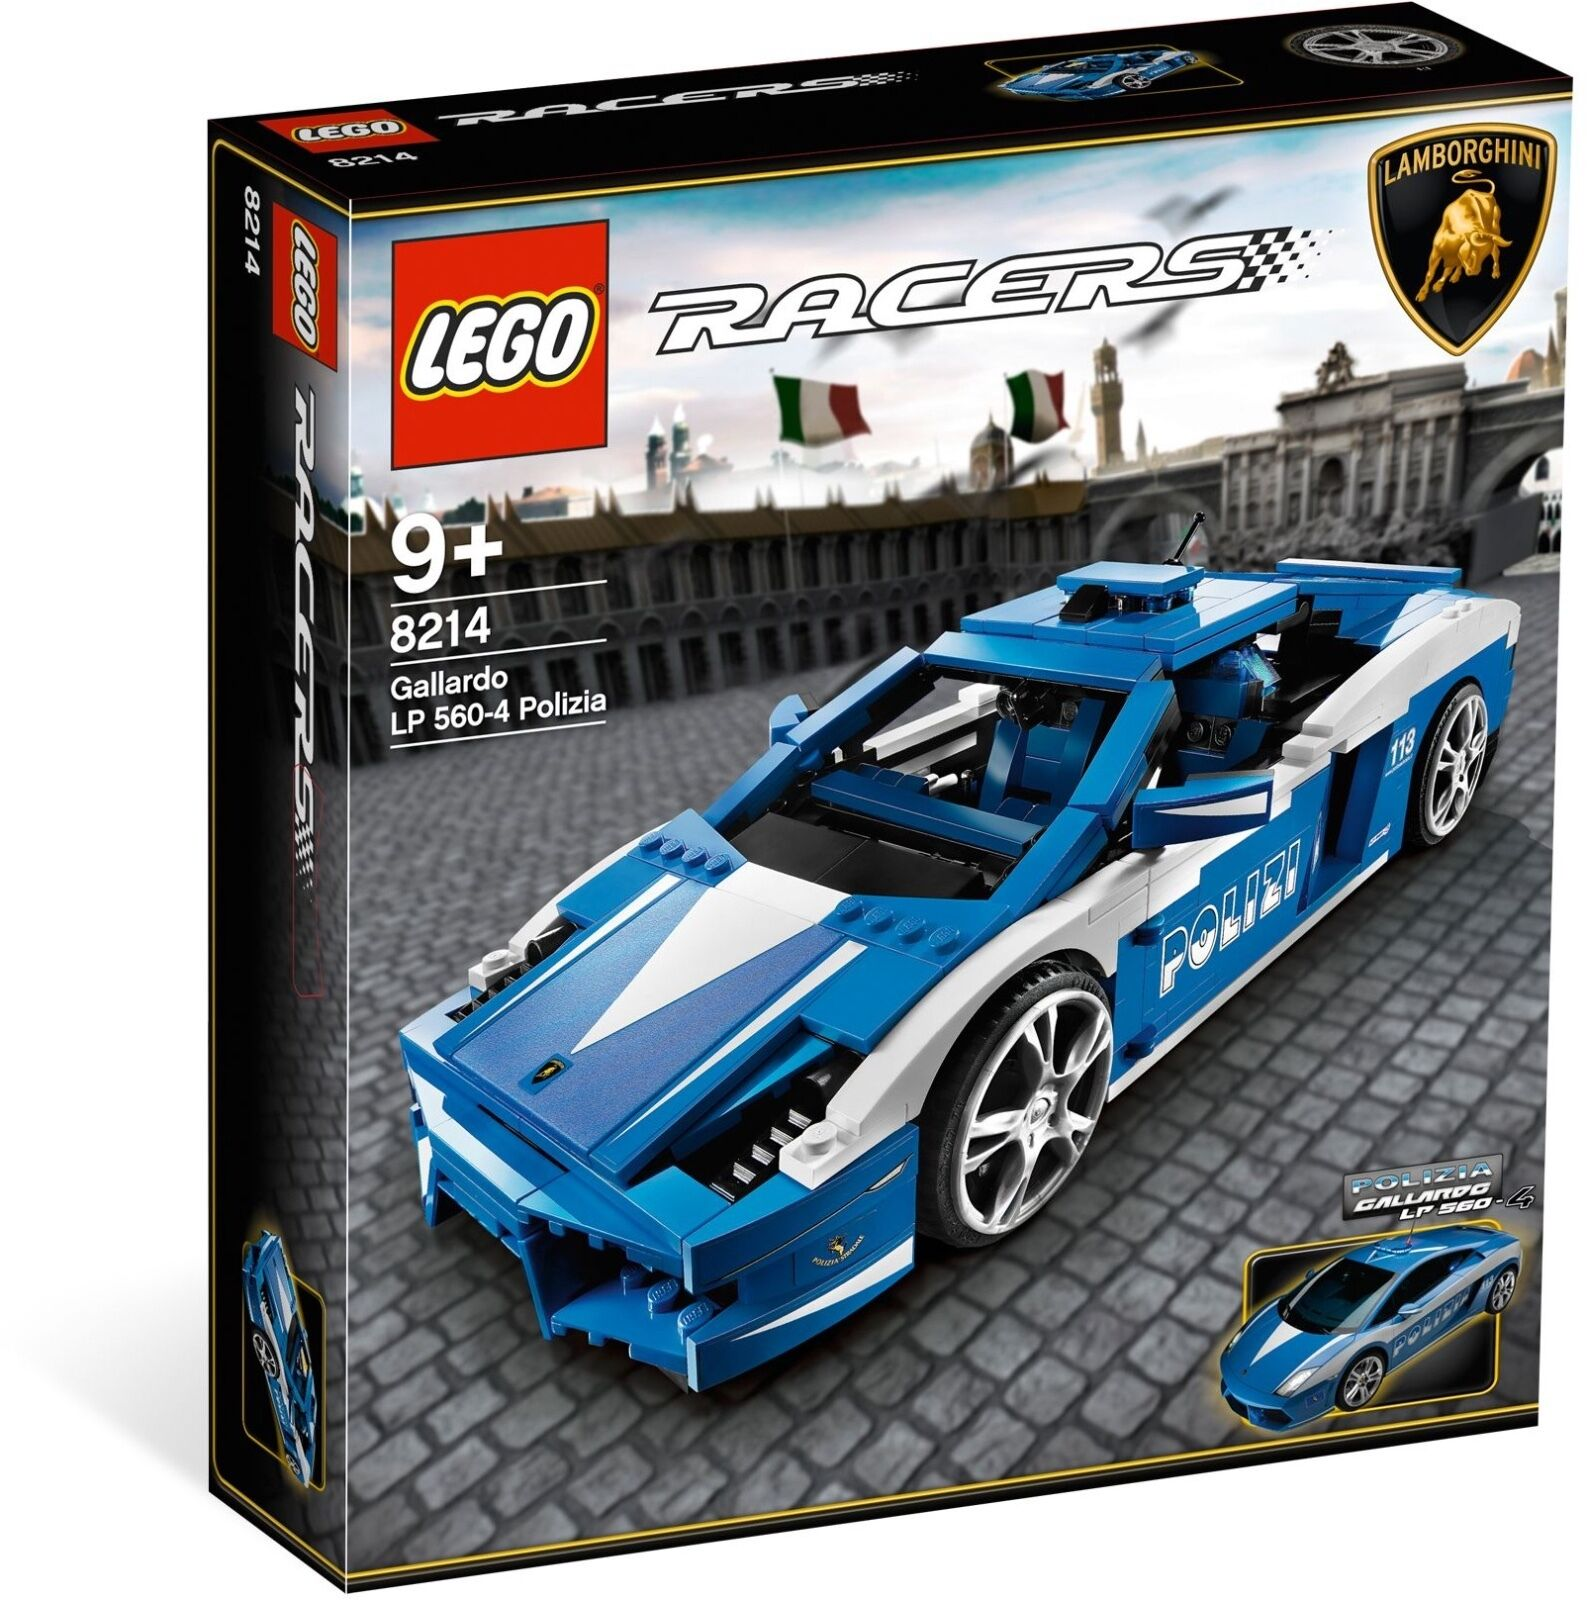 *BRAND NEW* LEGO Racers Gallardo LP 560-4 Polizia (8214)